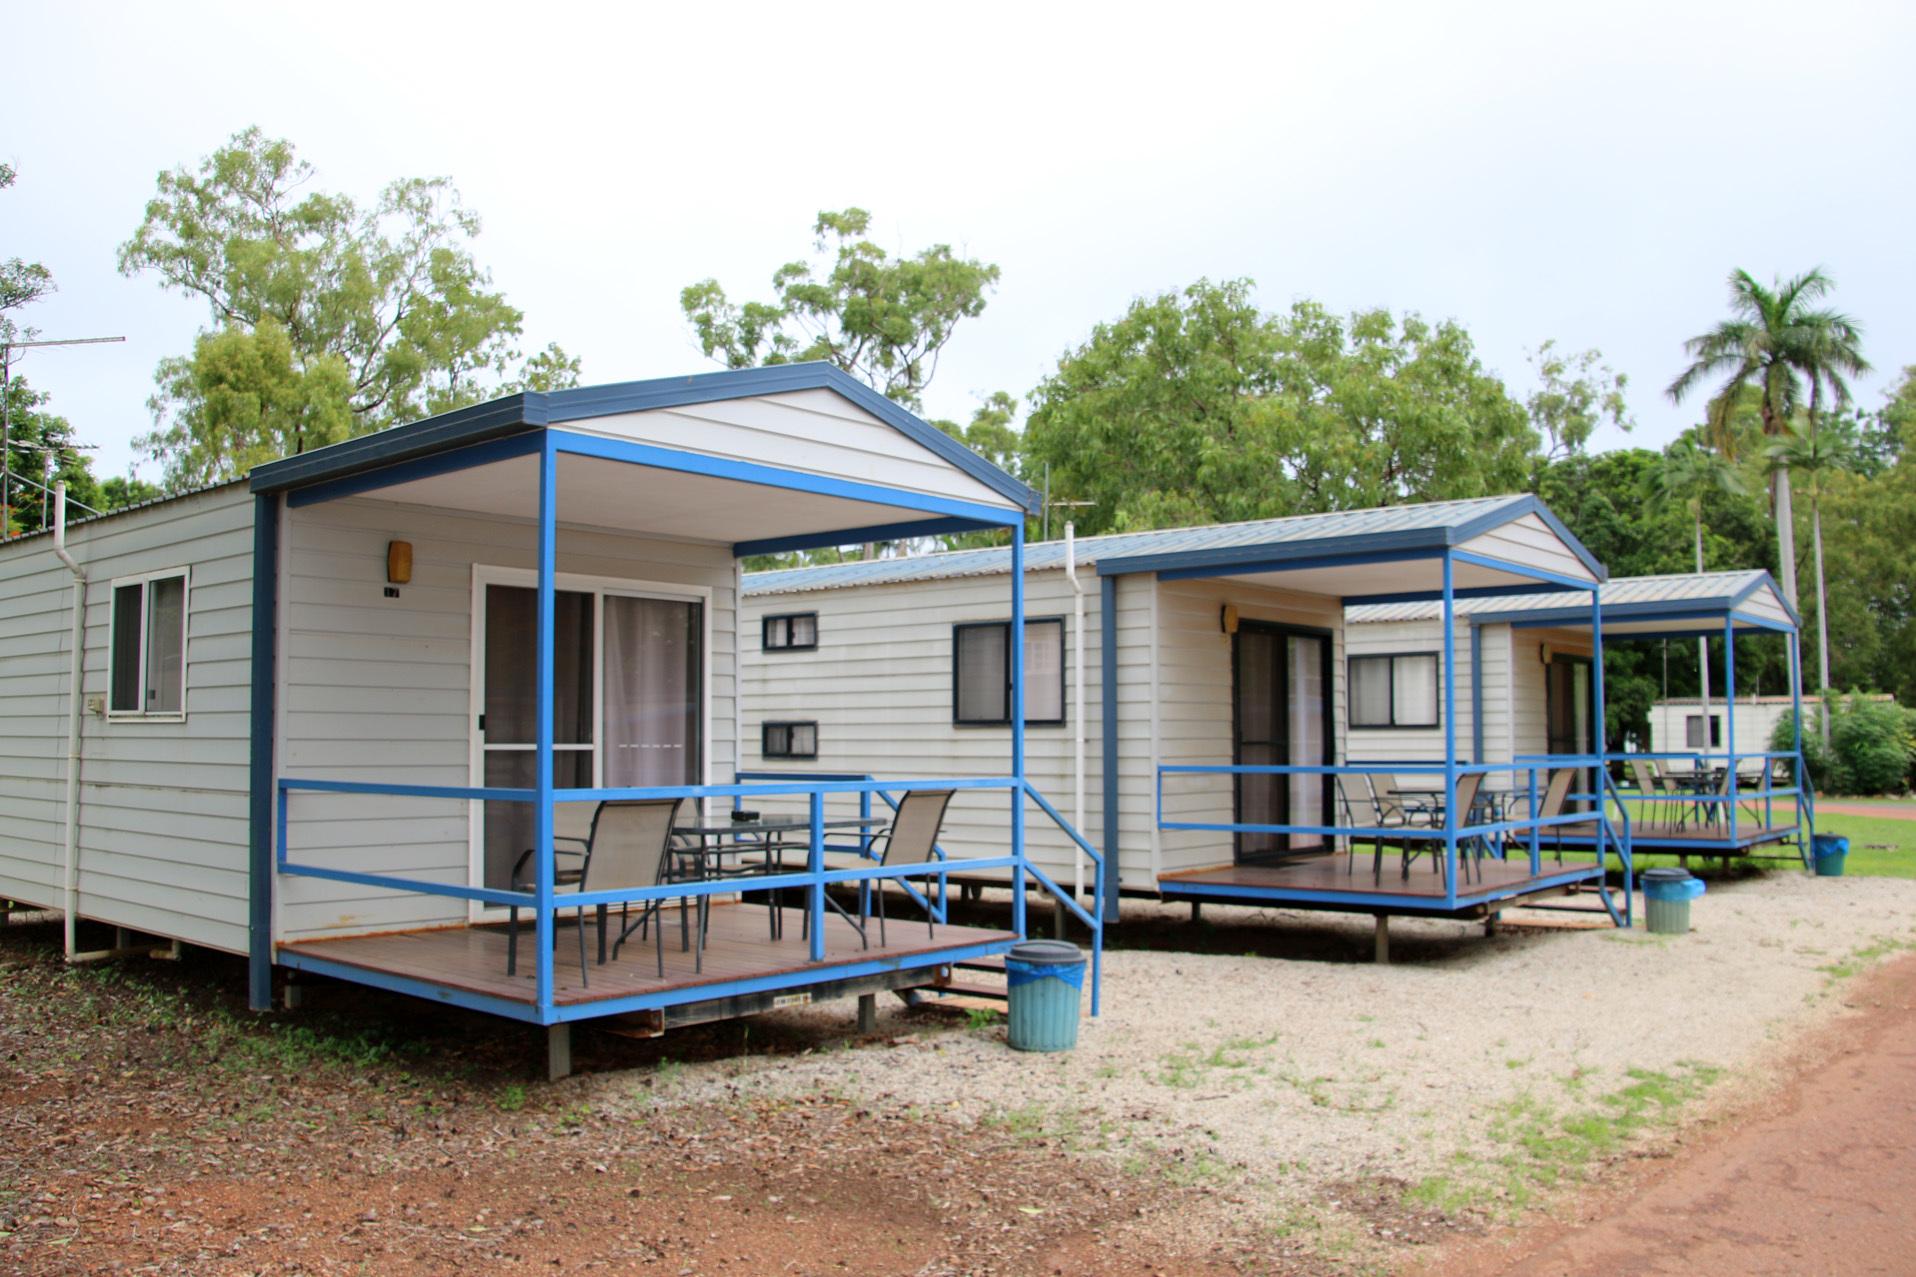 e - Weipa Caravan Park & Camping Ground